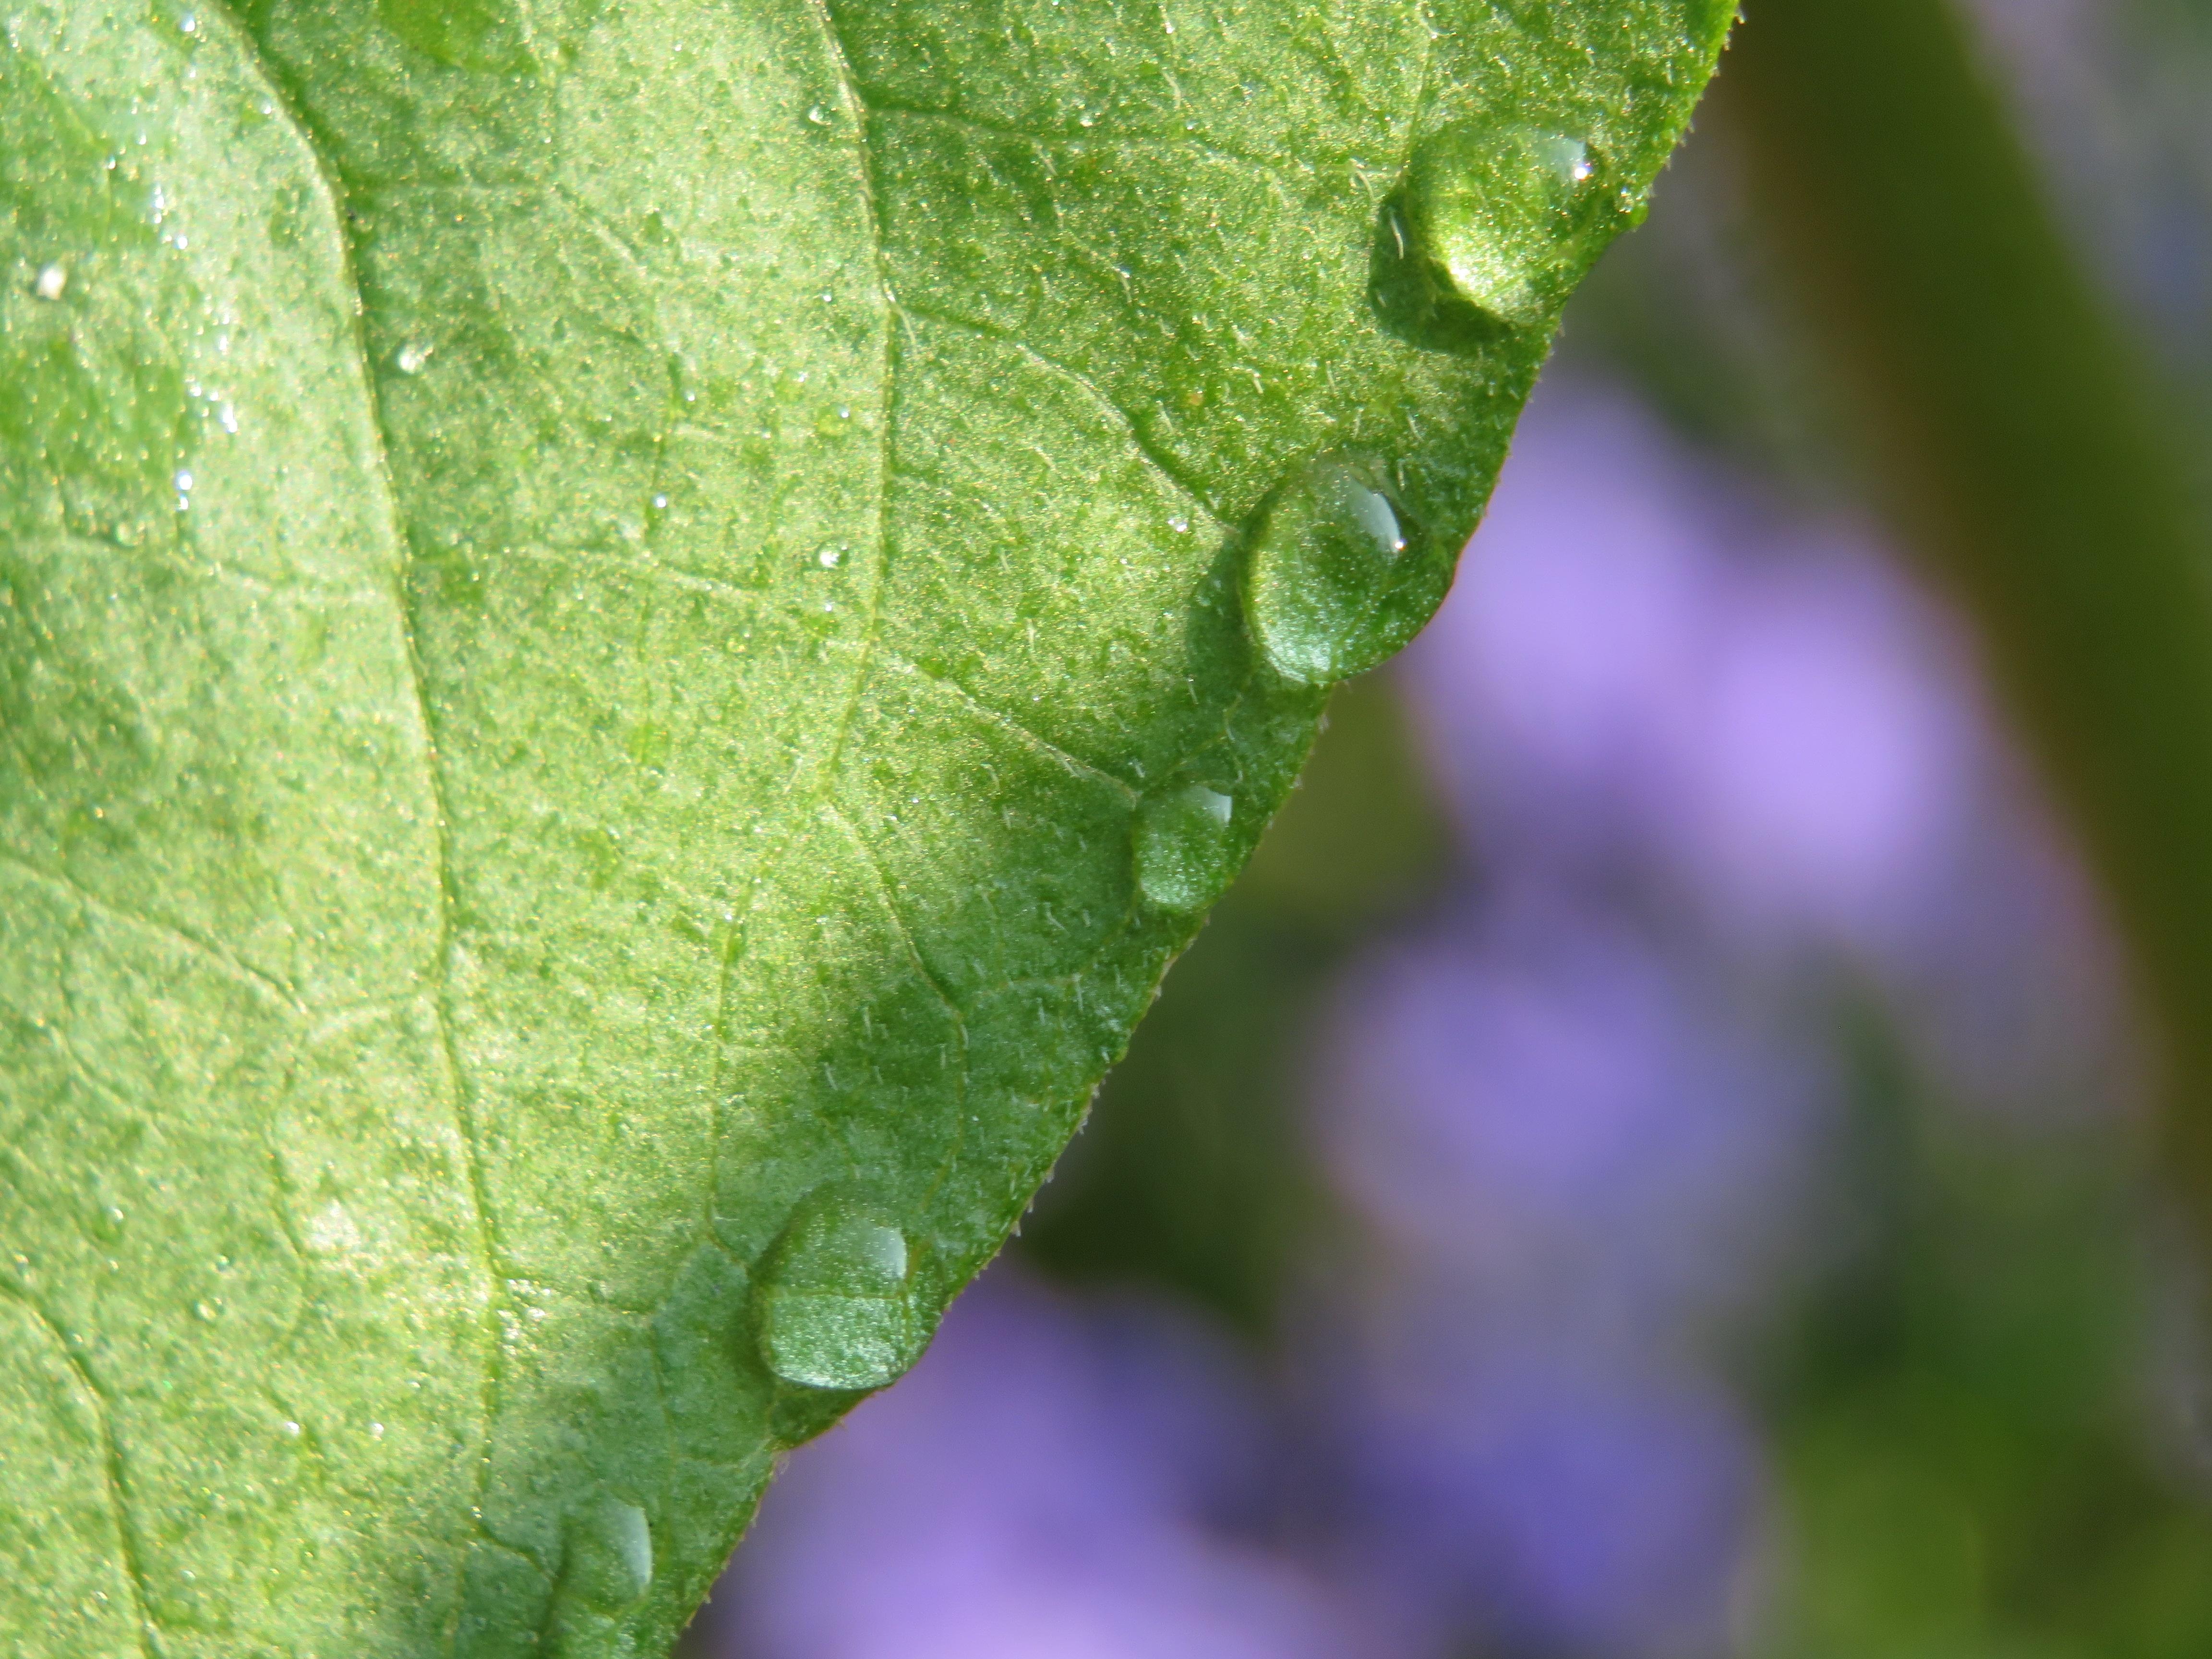 leaf edge drops